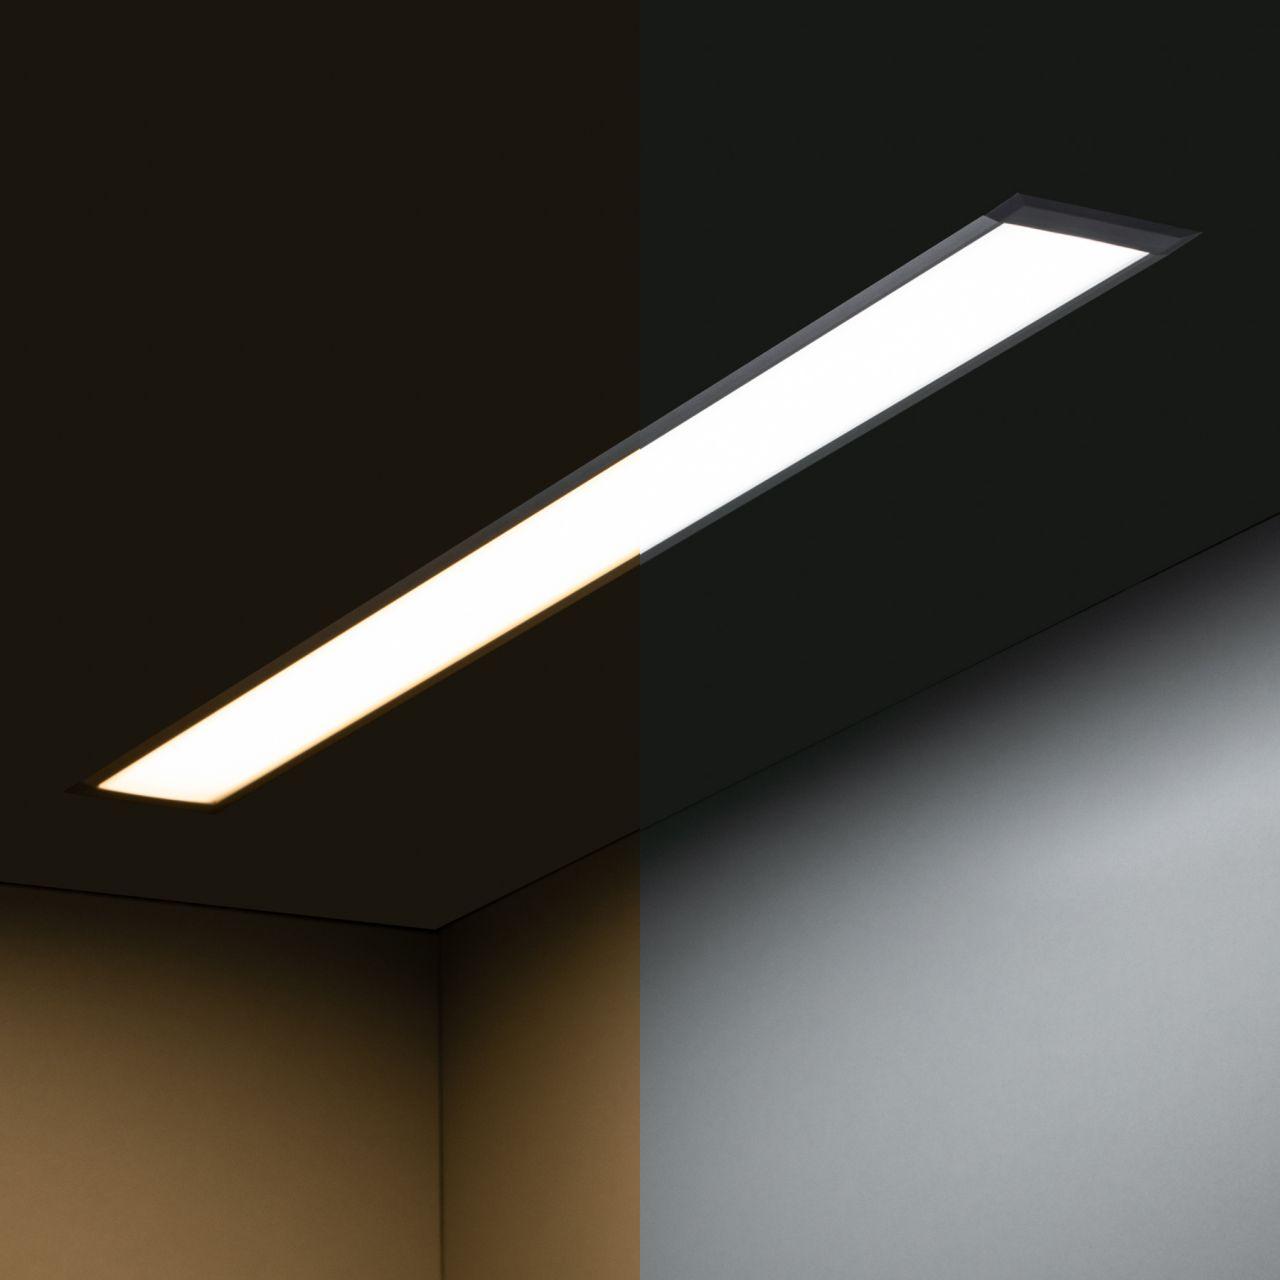 24V Aluminium LED Einbauleuchte – Farbtemperatur einstellbar – linear – diffuse Abdeckung